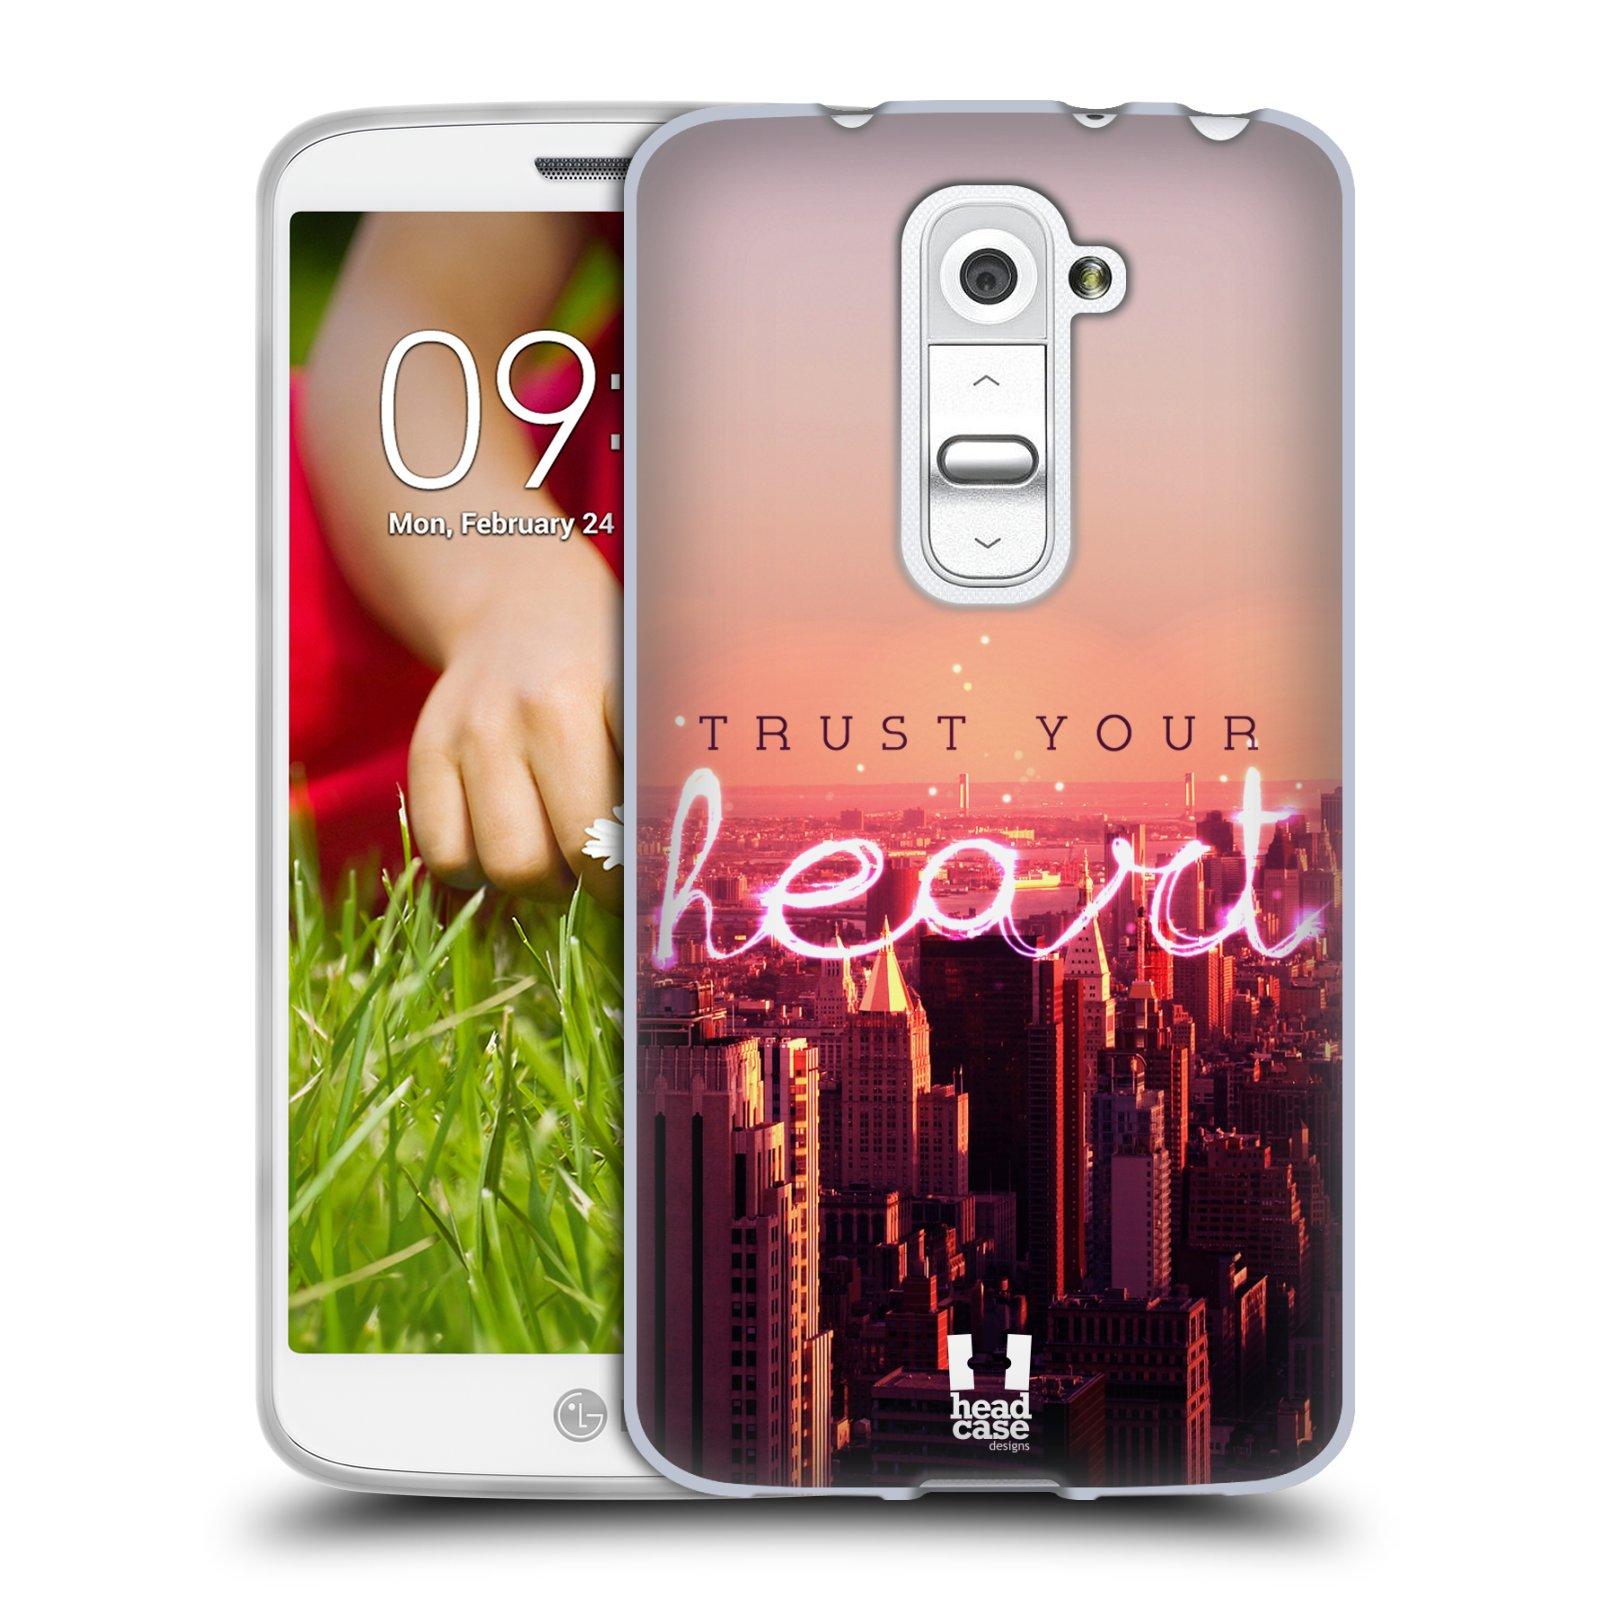 Silikonové pouzdro na mobil LG G2 Mini HEAD CASE TRUST YOUR HEART (Silikonový kryt či obal na mobilní telefon LG G2 Mini D620)